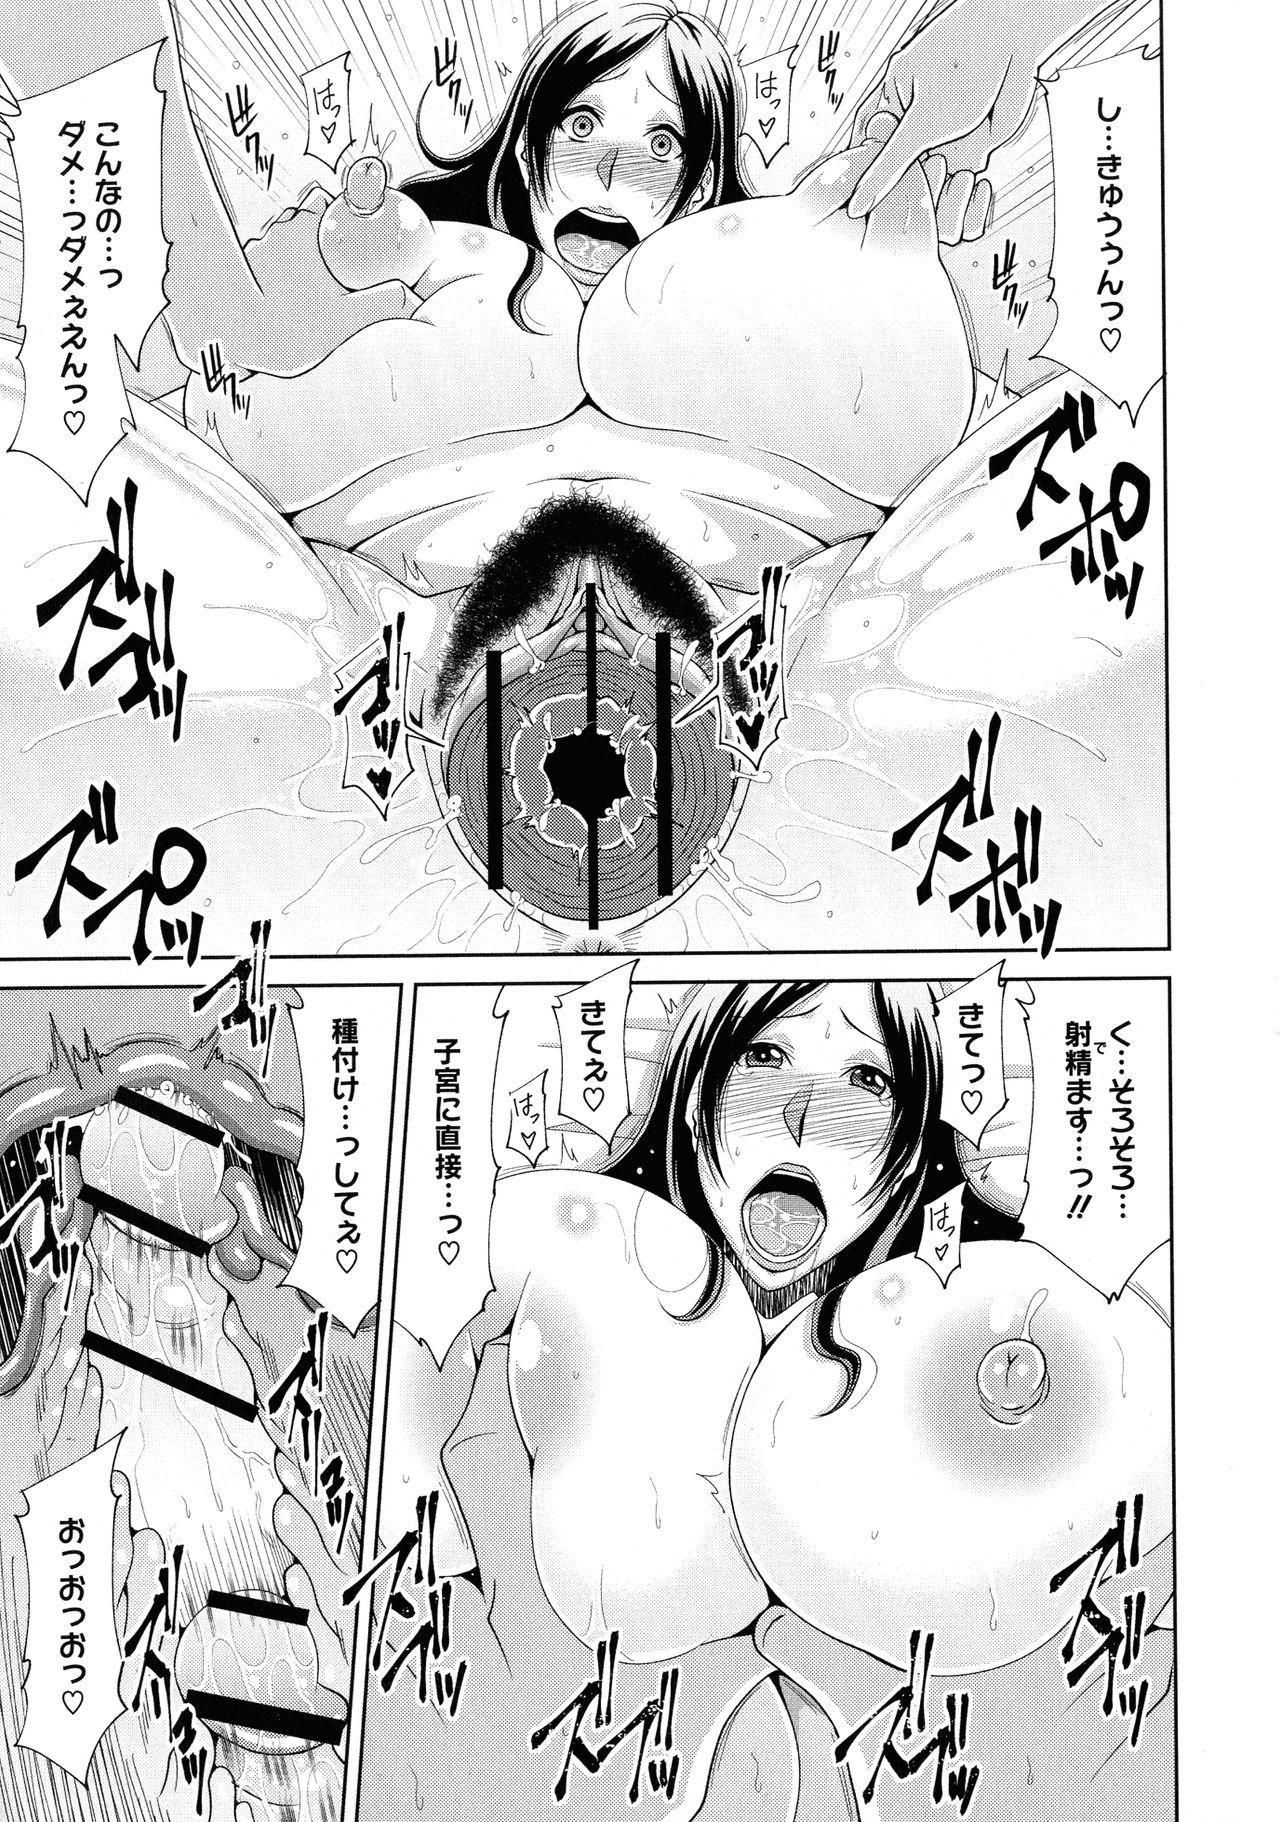 Haramase! 185